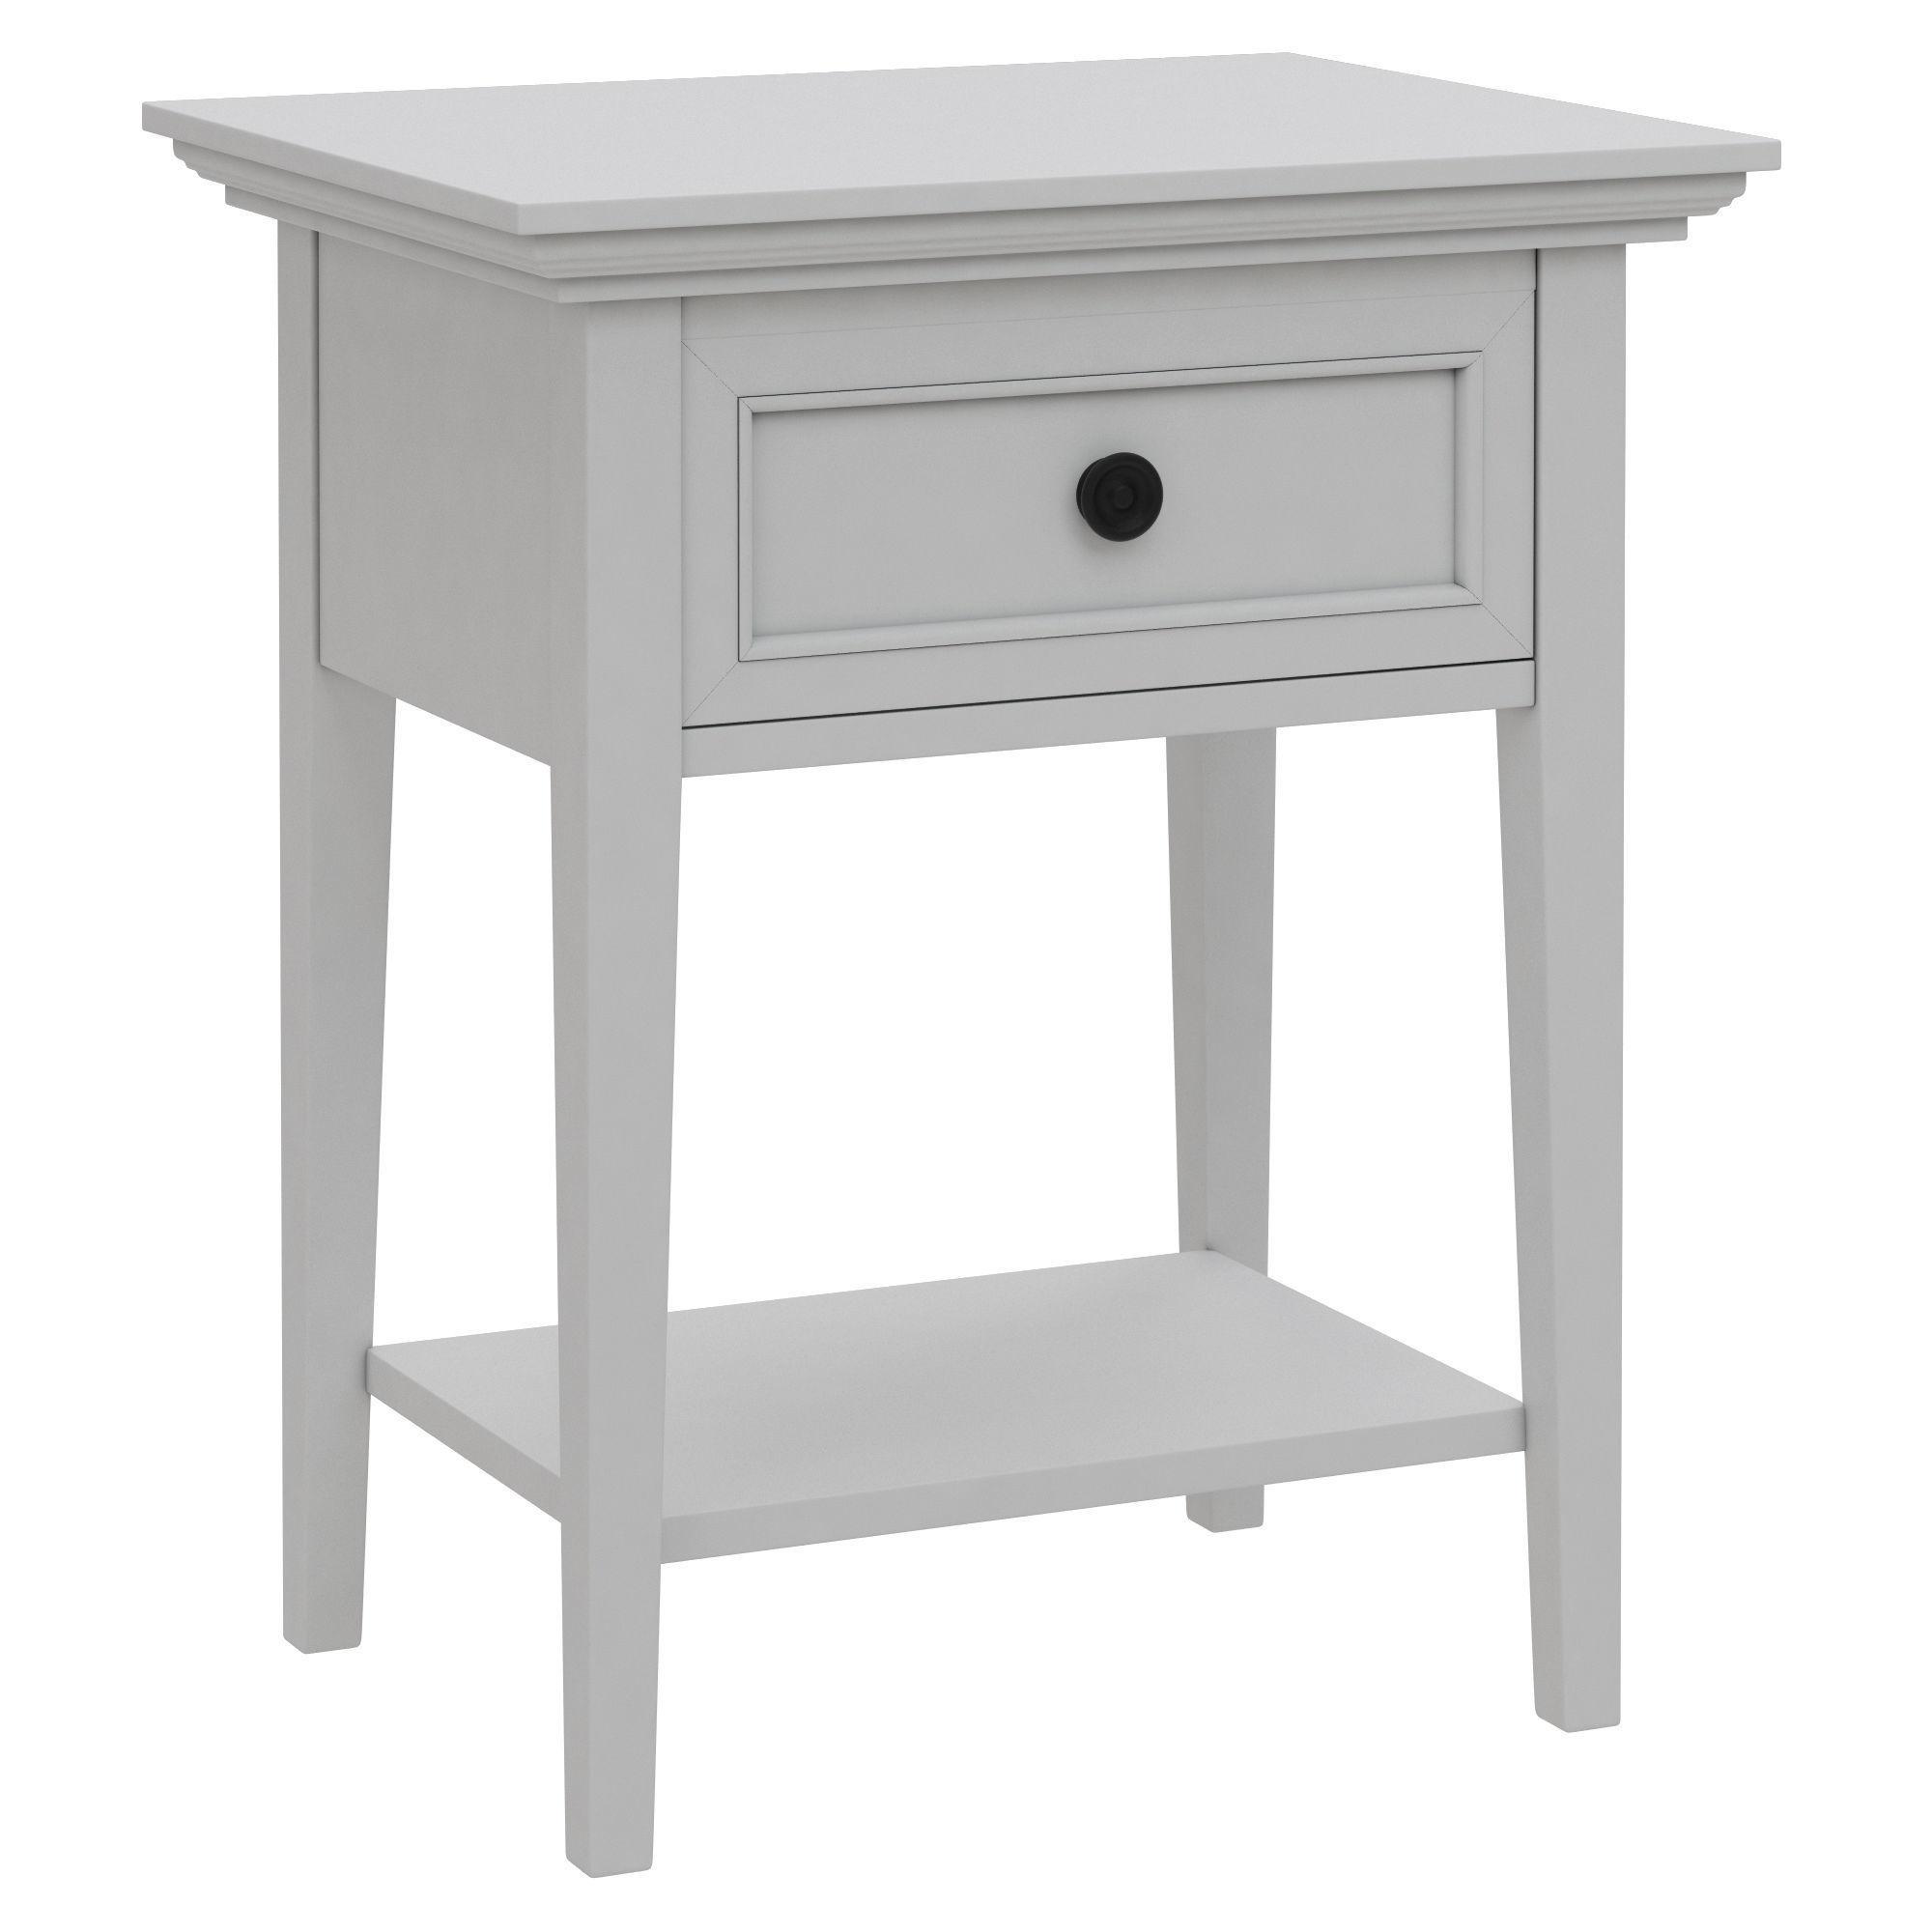 Dantone Home Junior bedside table